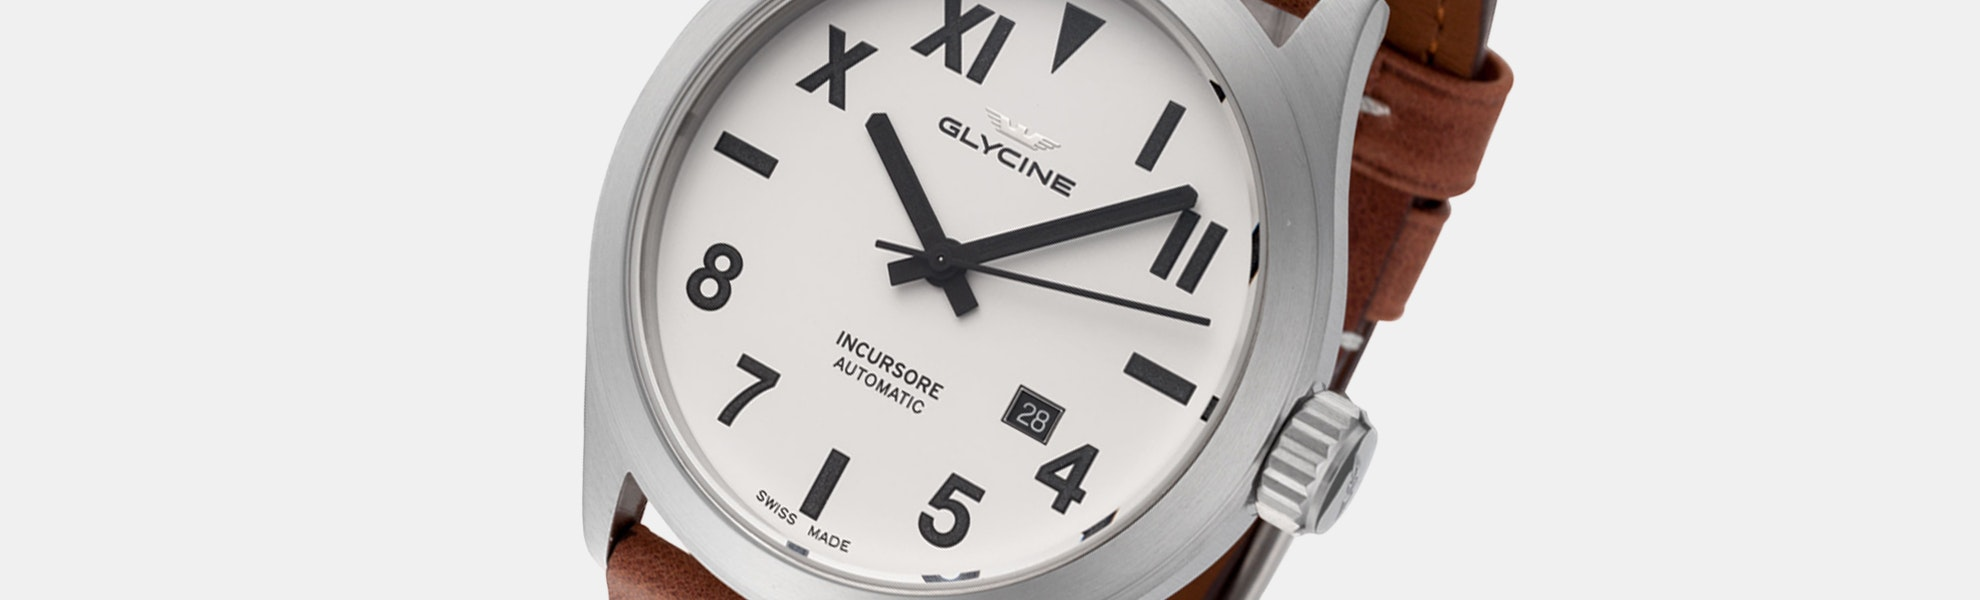 Glycine Incursore Automatic Watch